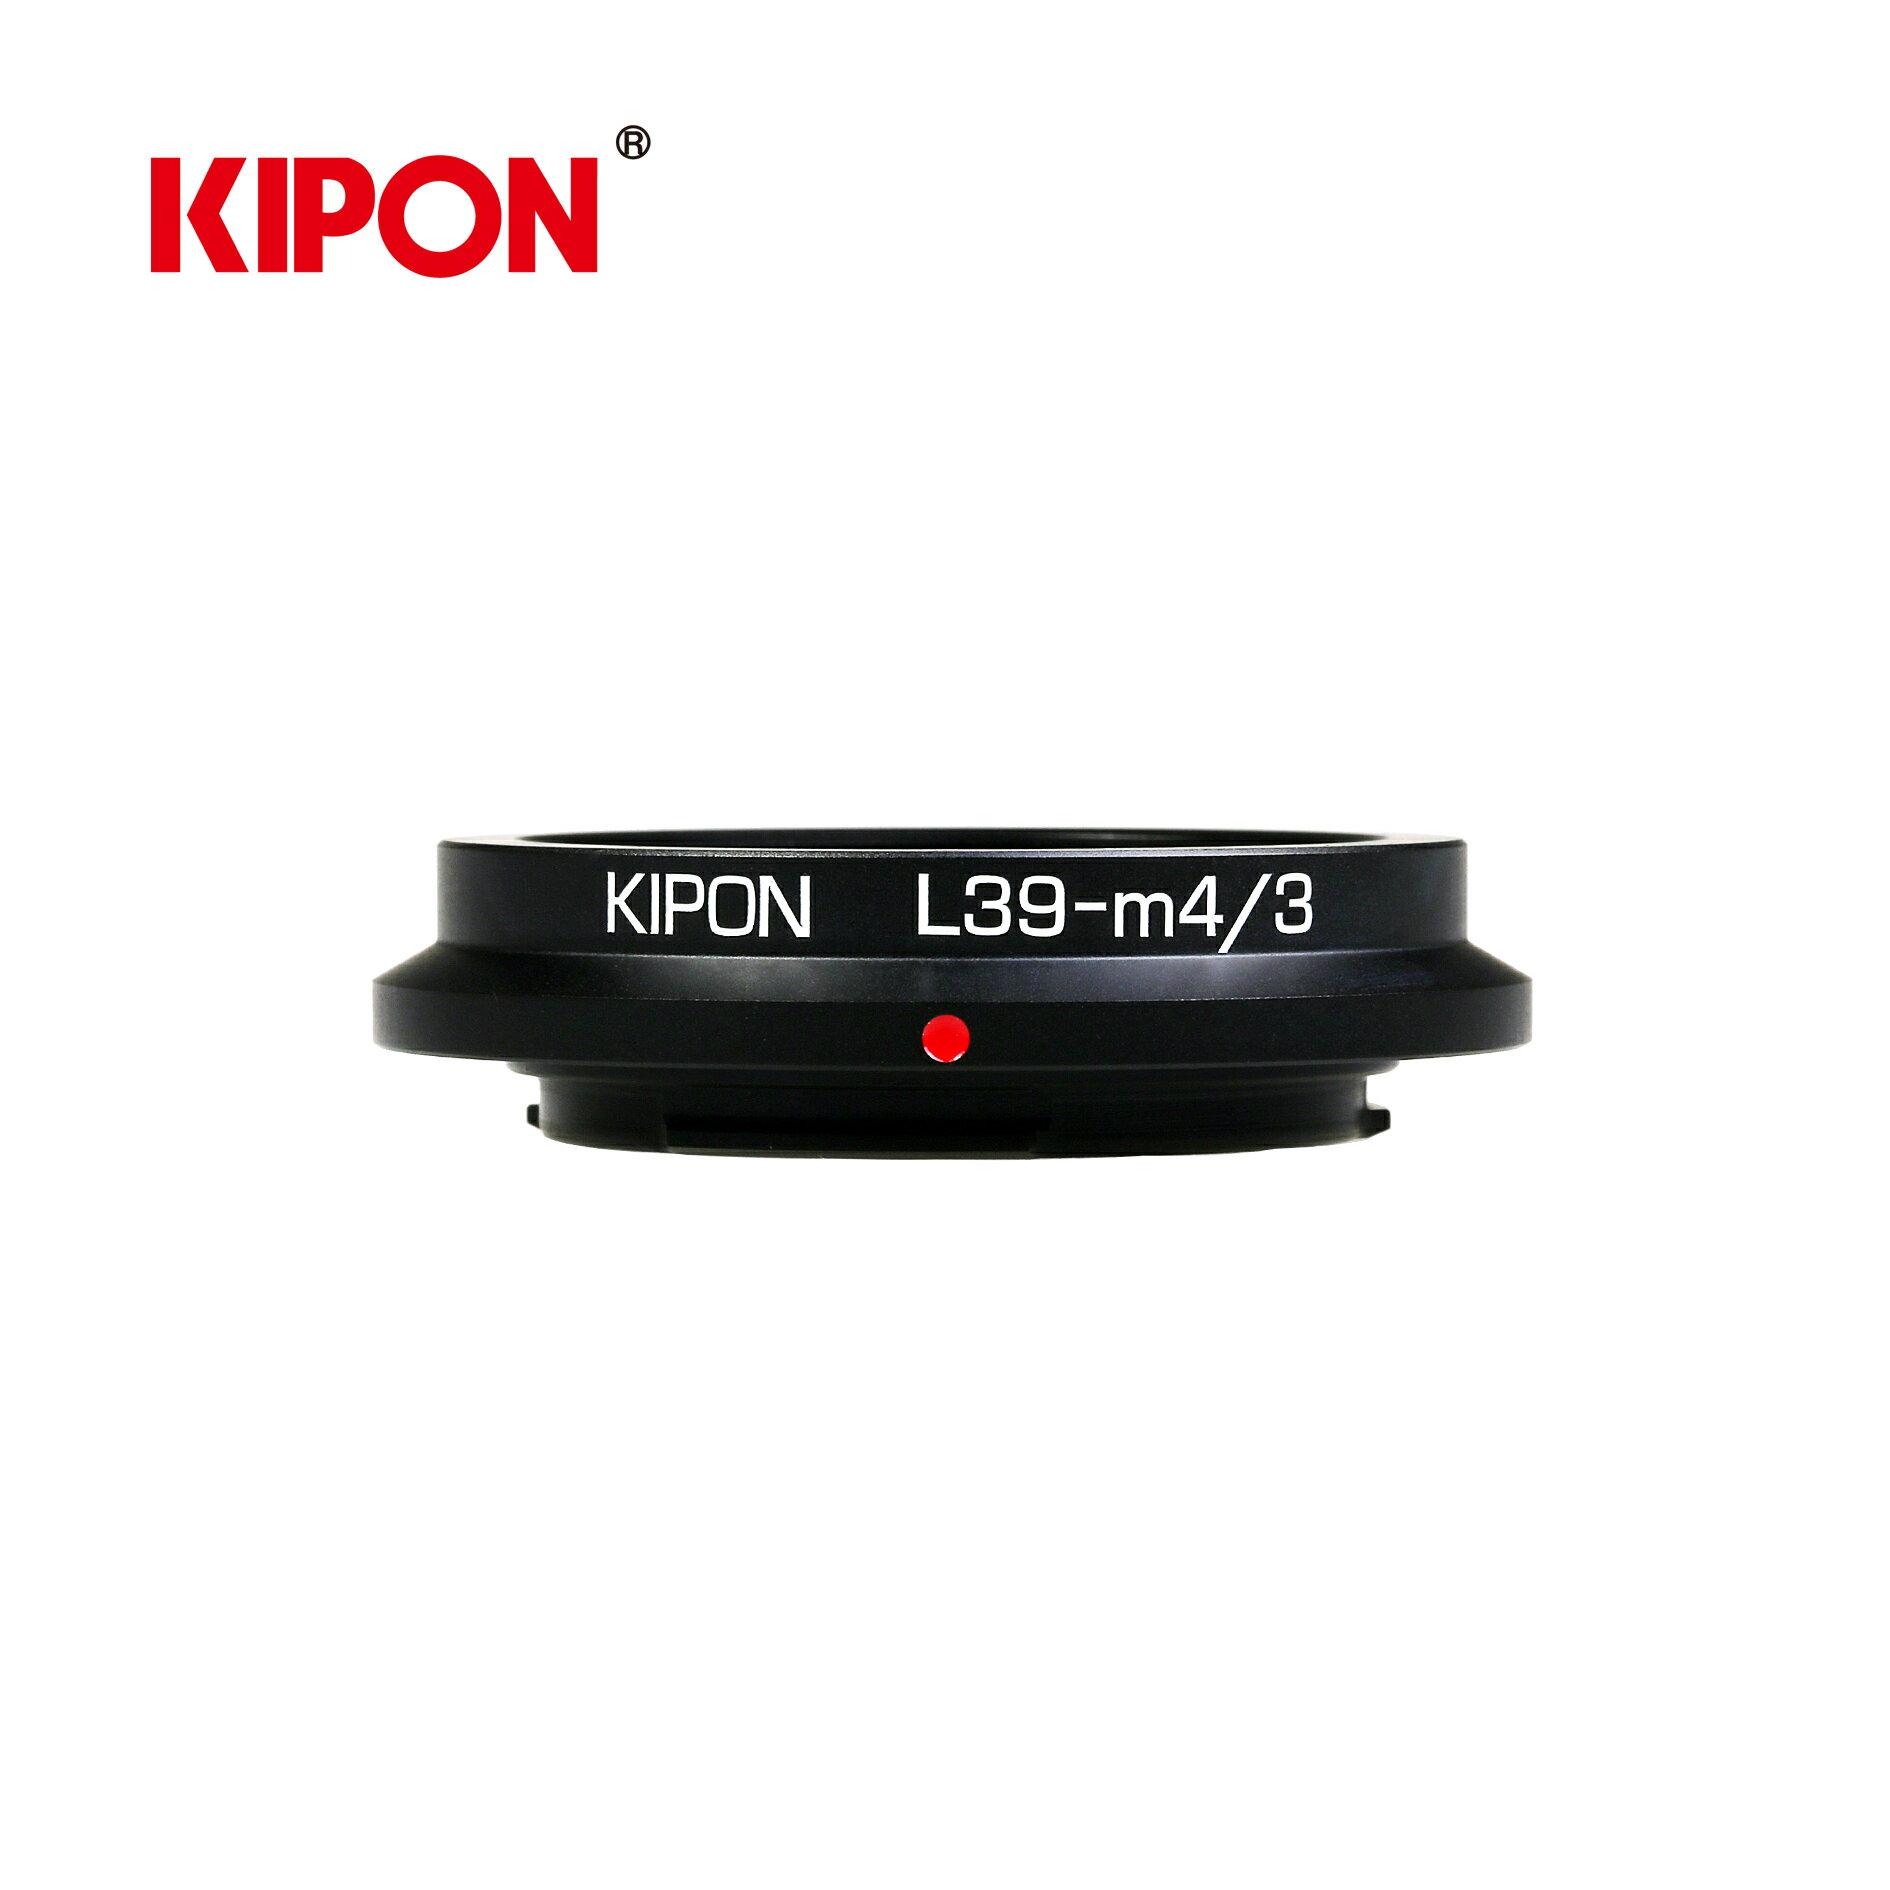 kipon L39-m4/3 (for Panasonic GX7/GX1/G10/GF6/GF5/GF3/GF2/GM1)